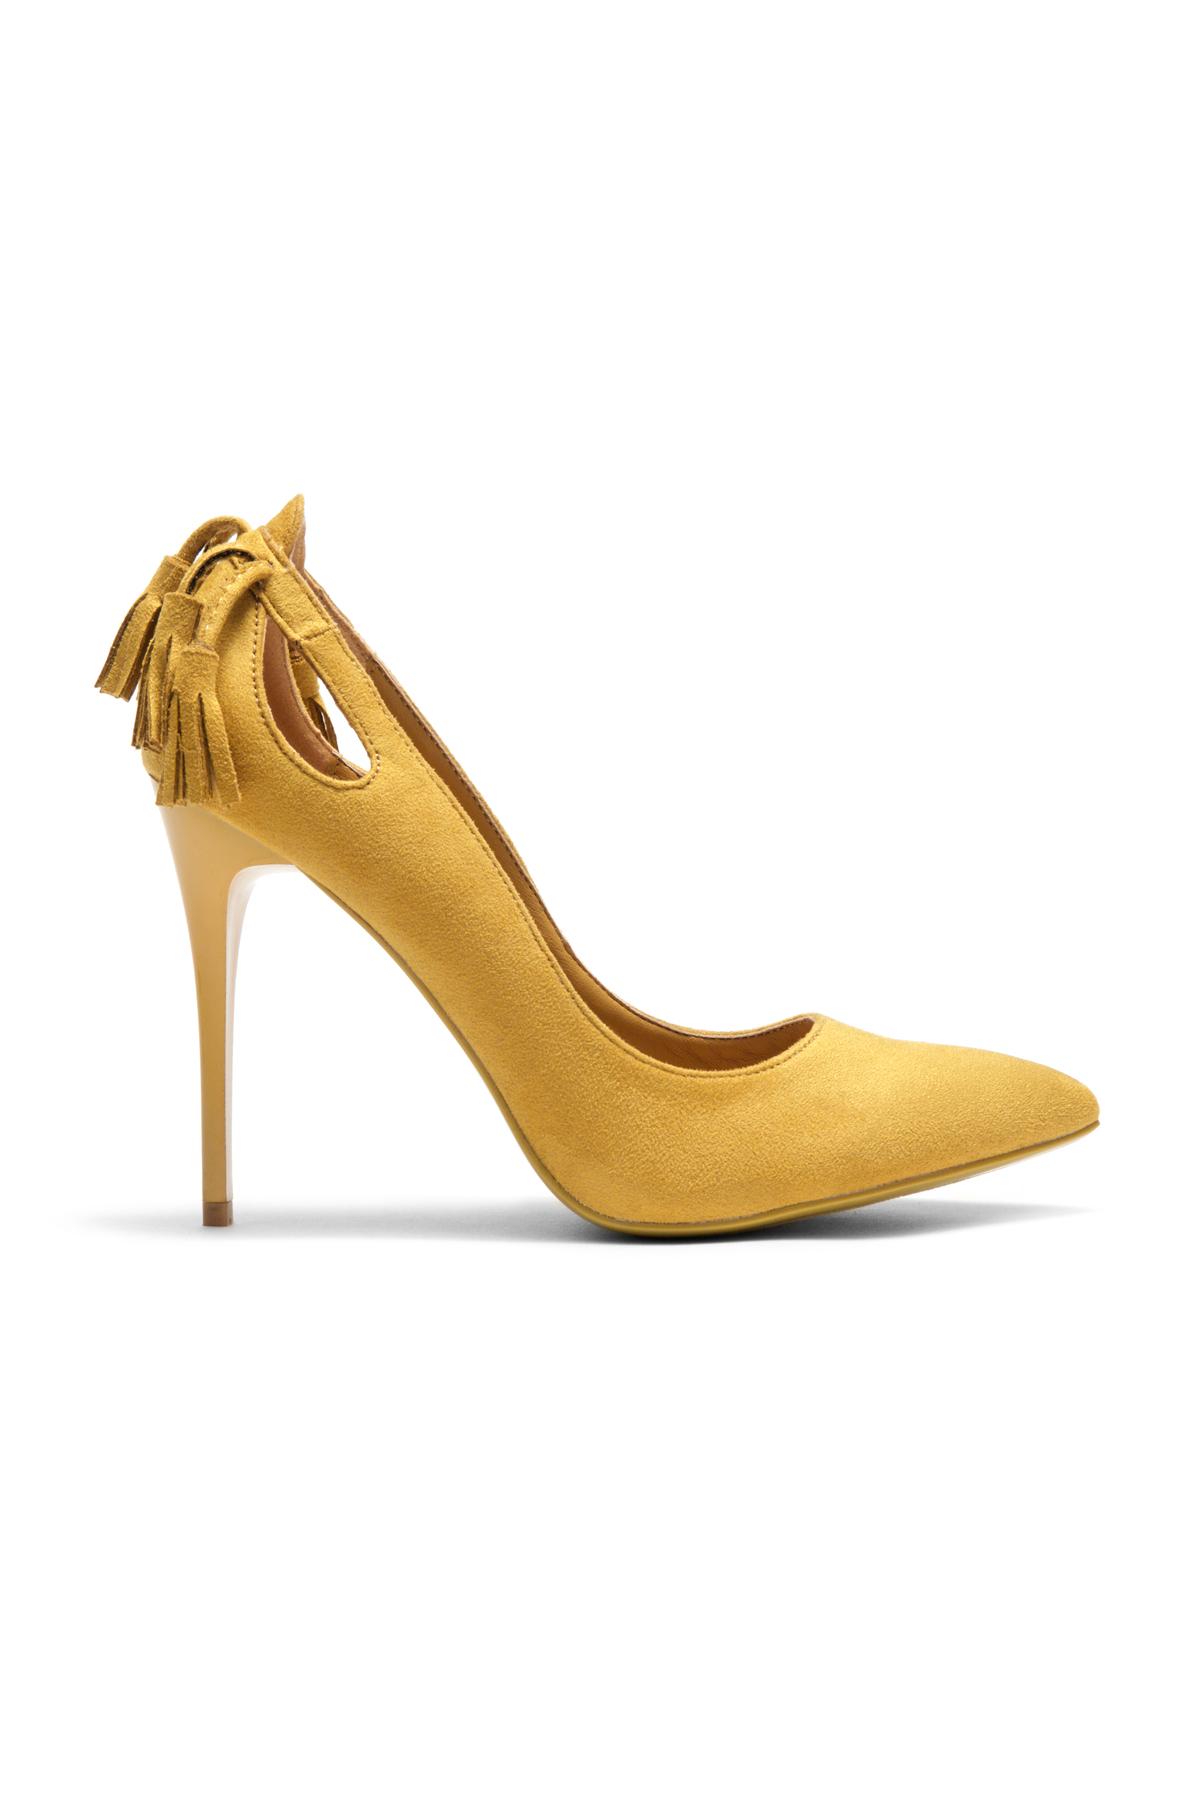 34f0e2befeff7 Women s Mustard Mazama 4-inch Pump Heel with Tassled Back